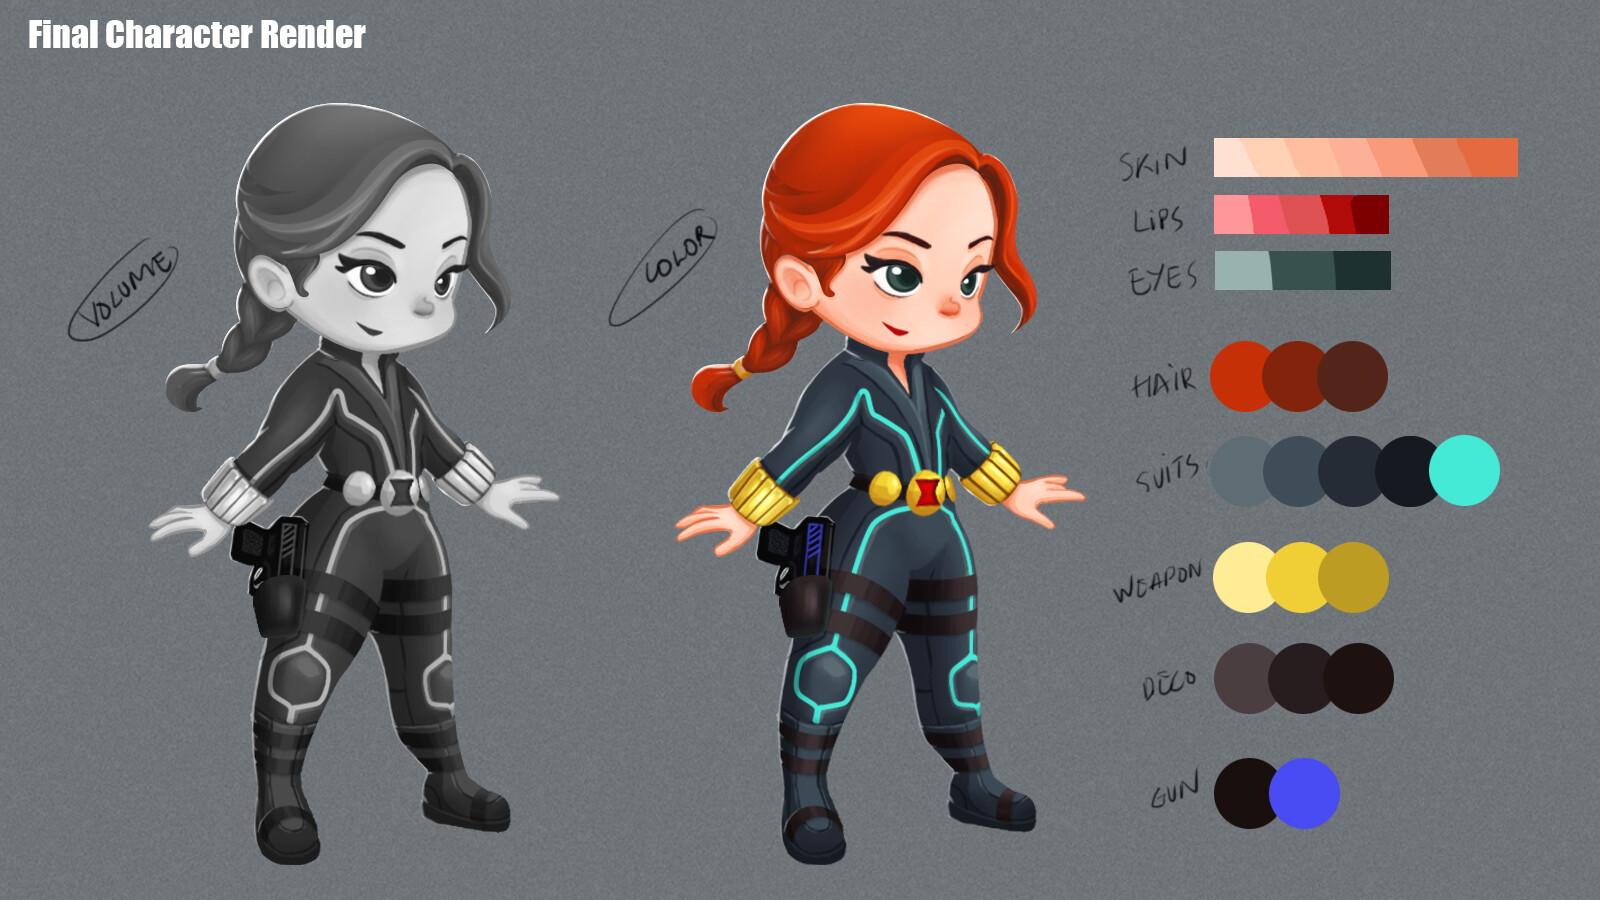 Black Widow Design and color scheme